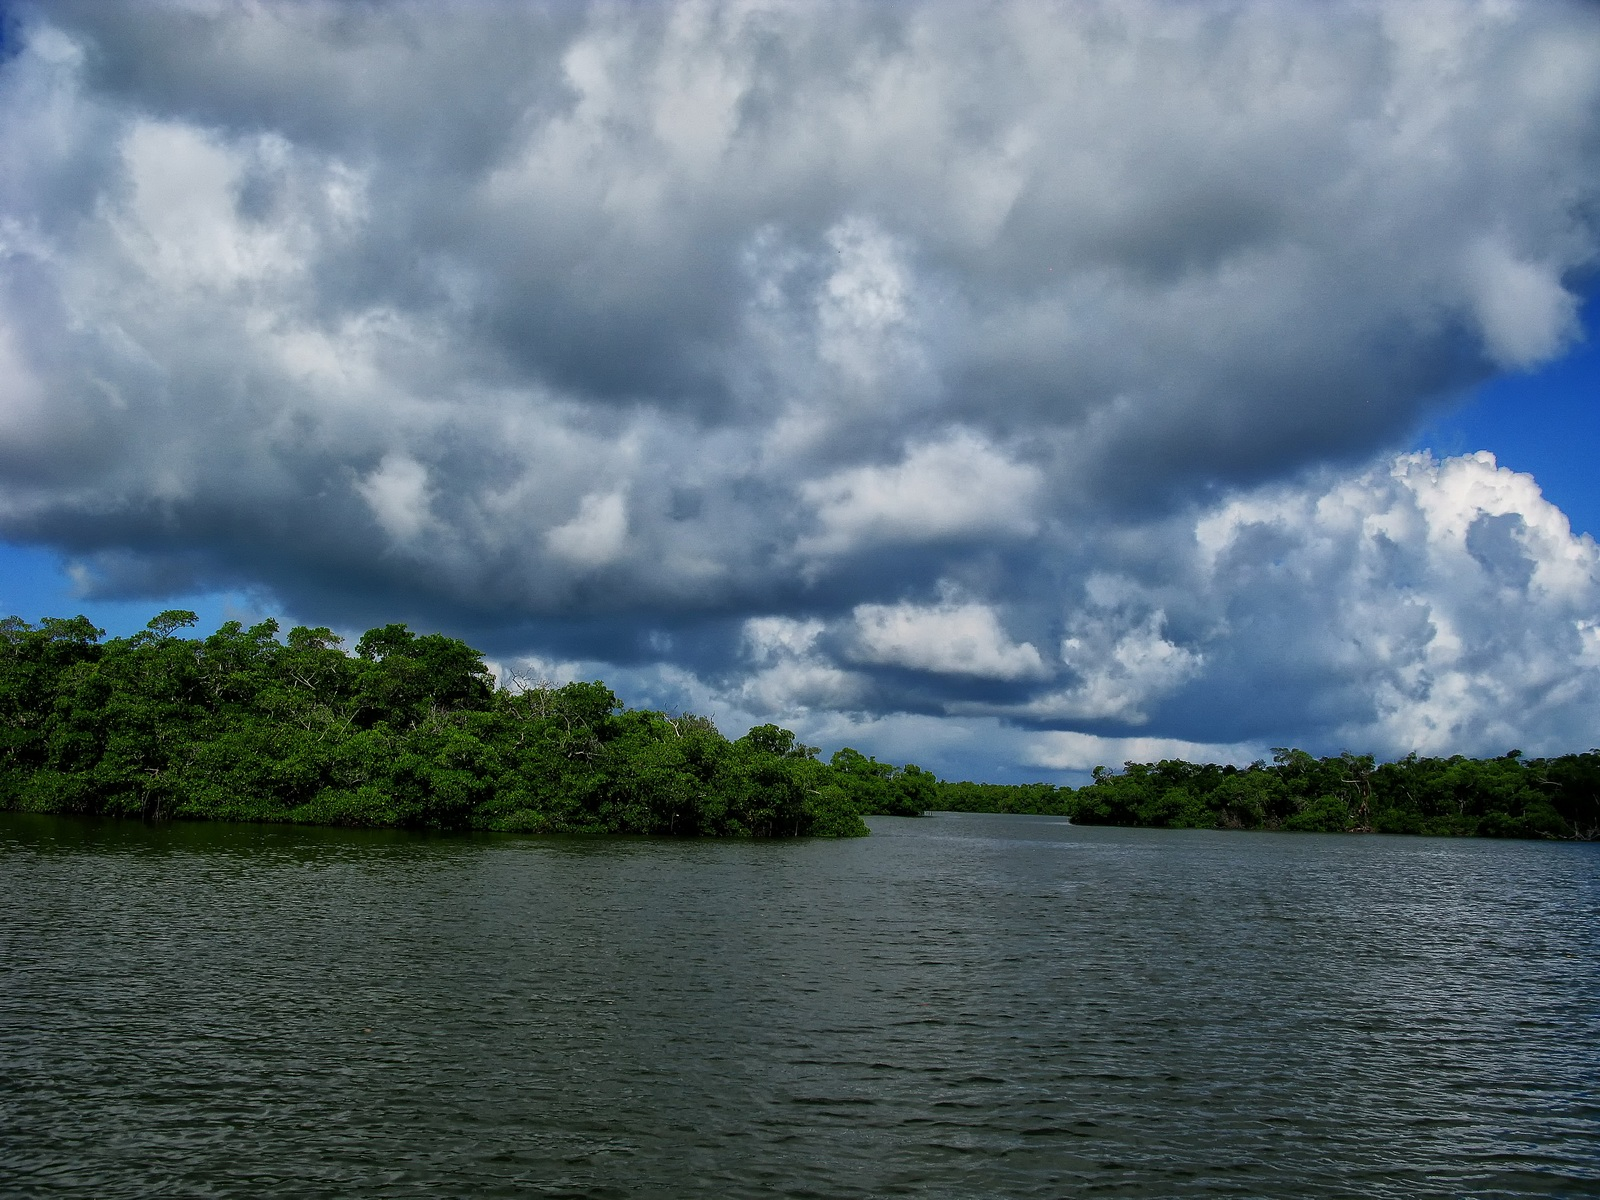 florida, sanibel island, j.n. ding darling wildlife refuge, mangrove,, photo